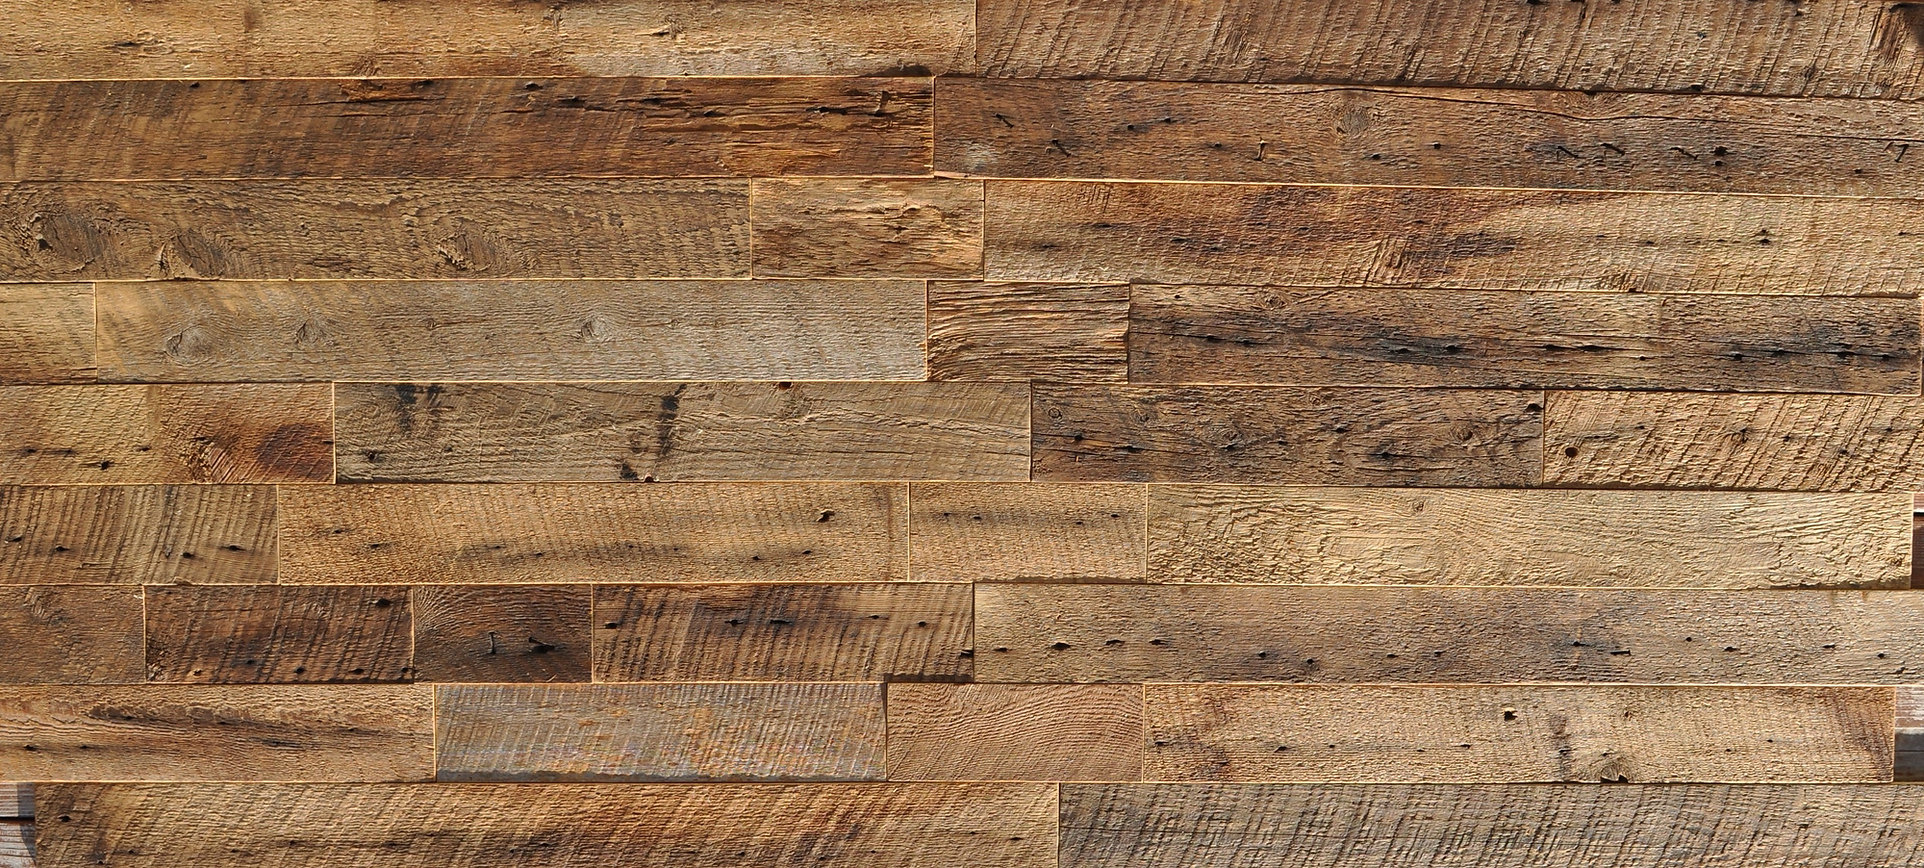 reclaimed wood Wall Paneling texture.jpg